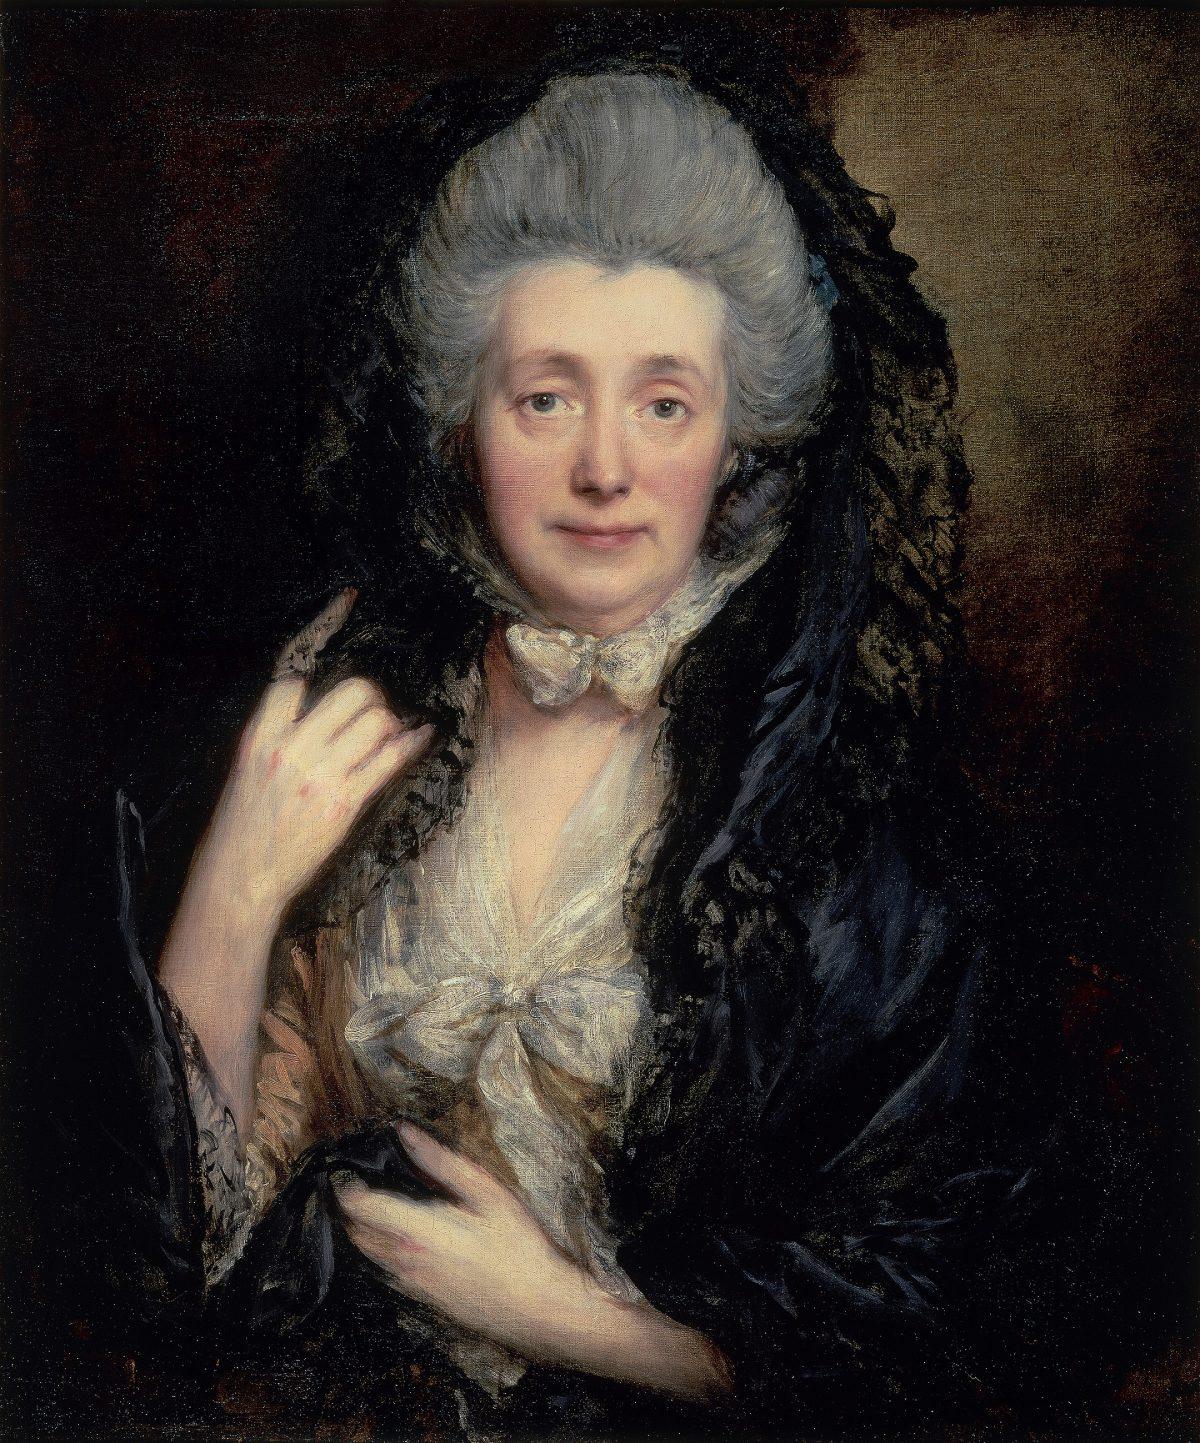 Mature 18th century lady